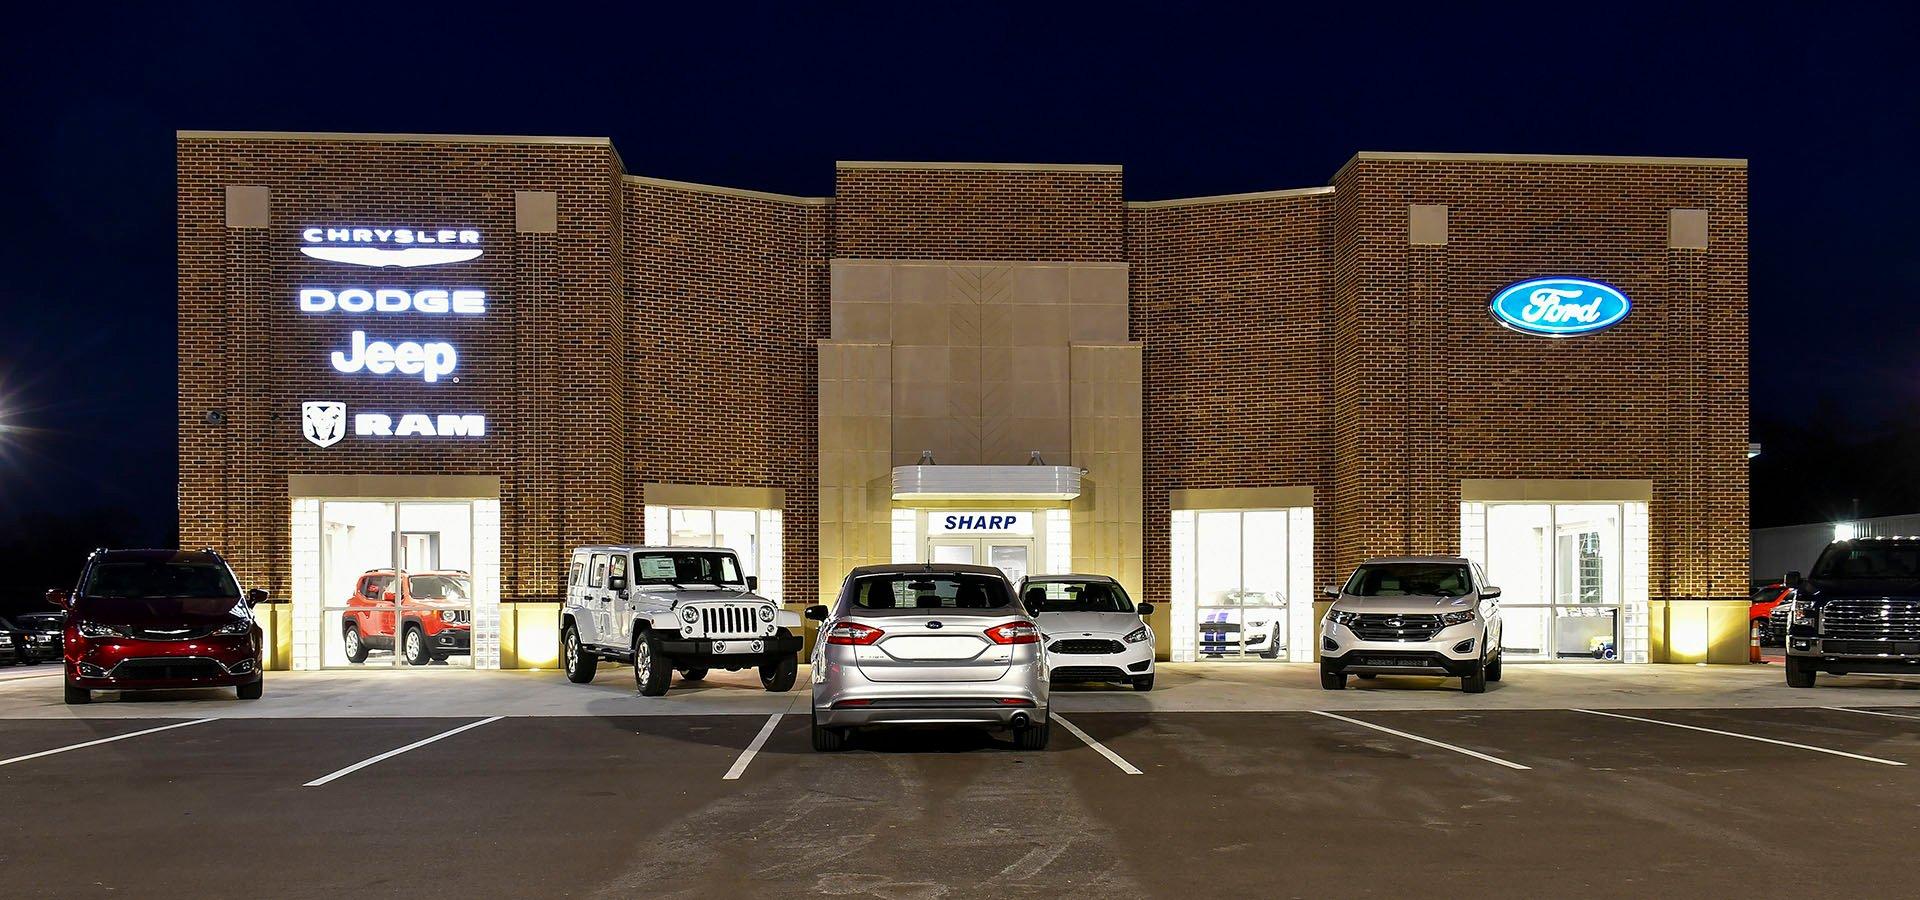 Sharp motor Company | Pulaski, Tennessee | Brindley Construction, LLC.